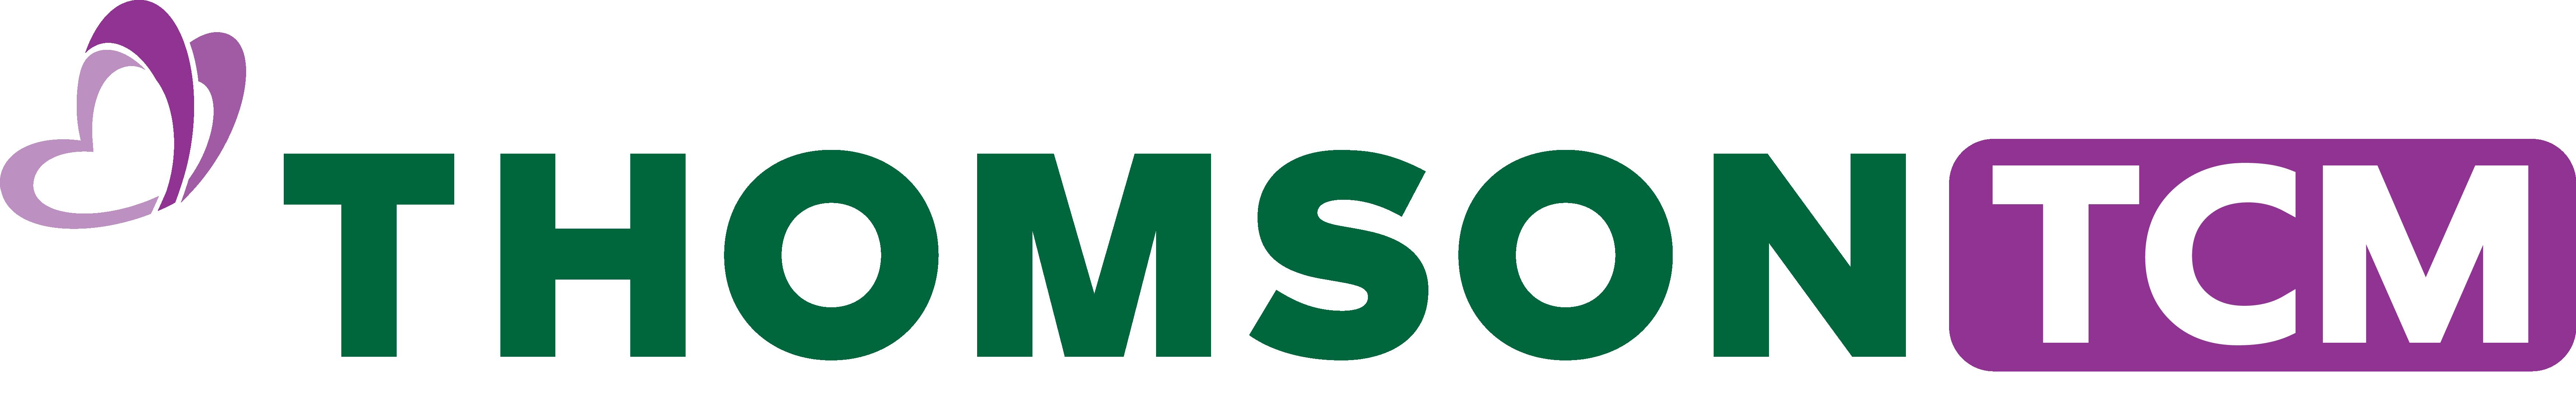 Thomson TCM